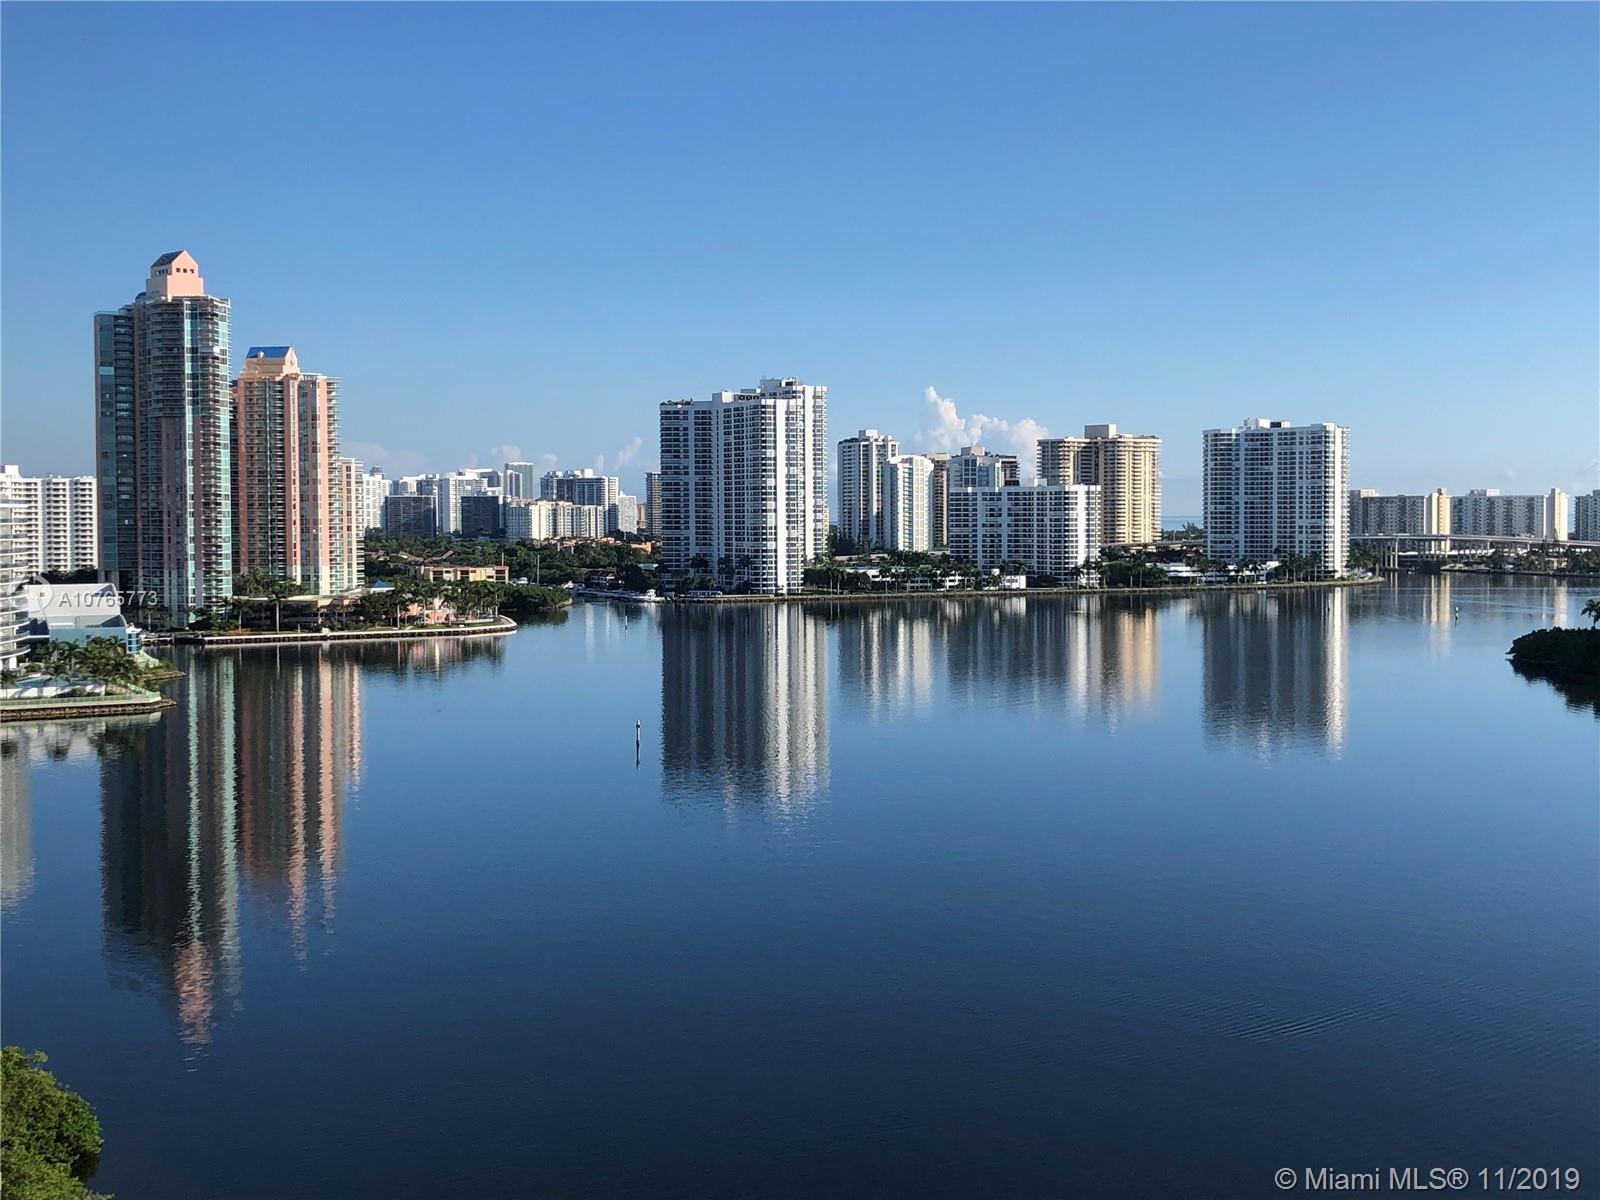 7000 Williams Island #1407 - 7000 Island Blvd #1407, Aventura, FL 33160